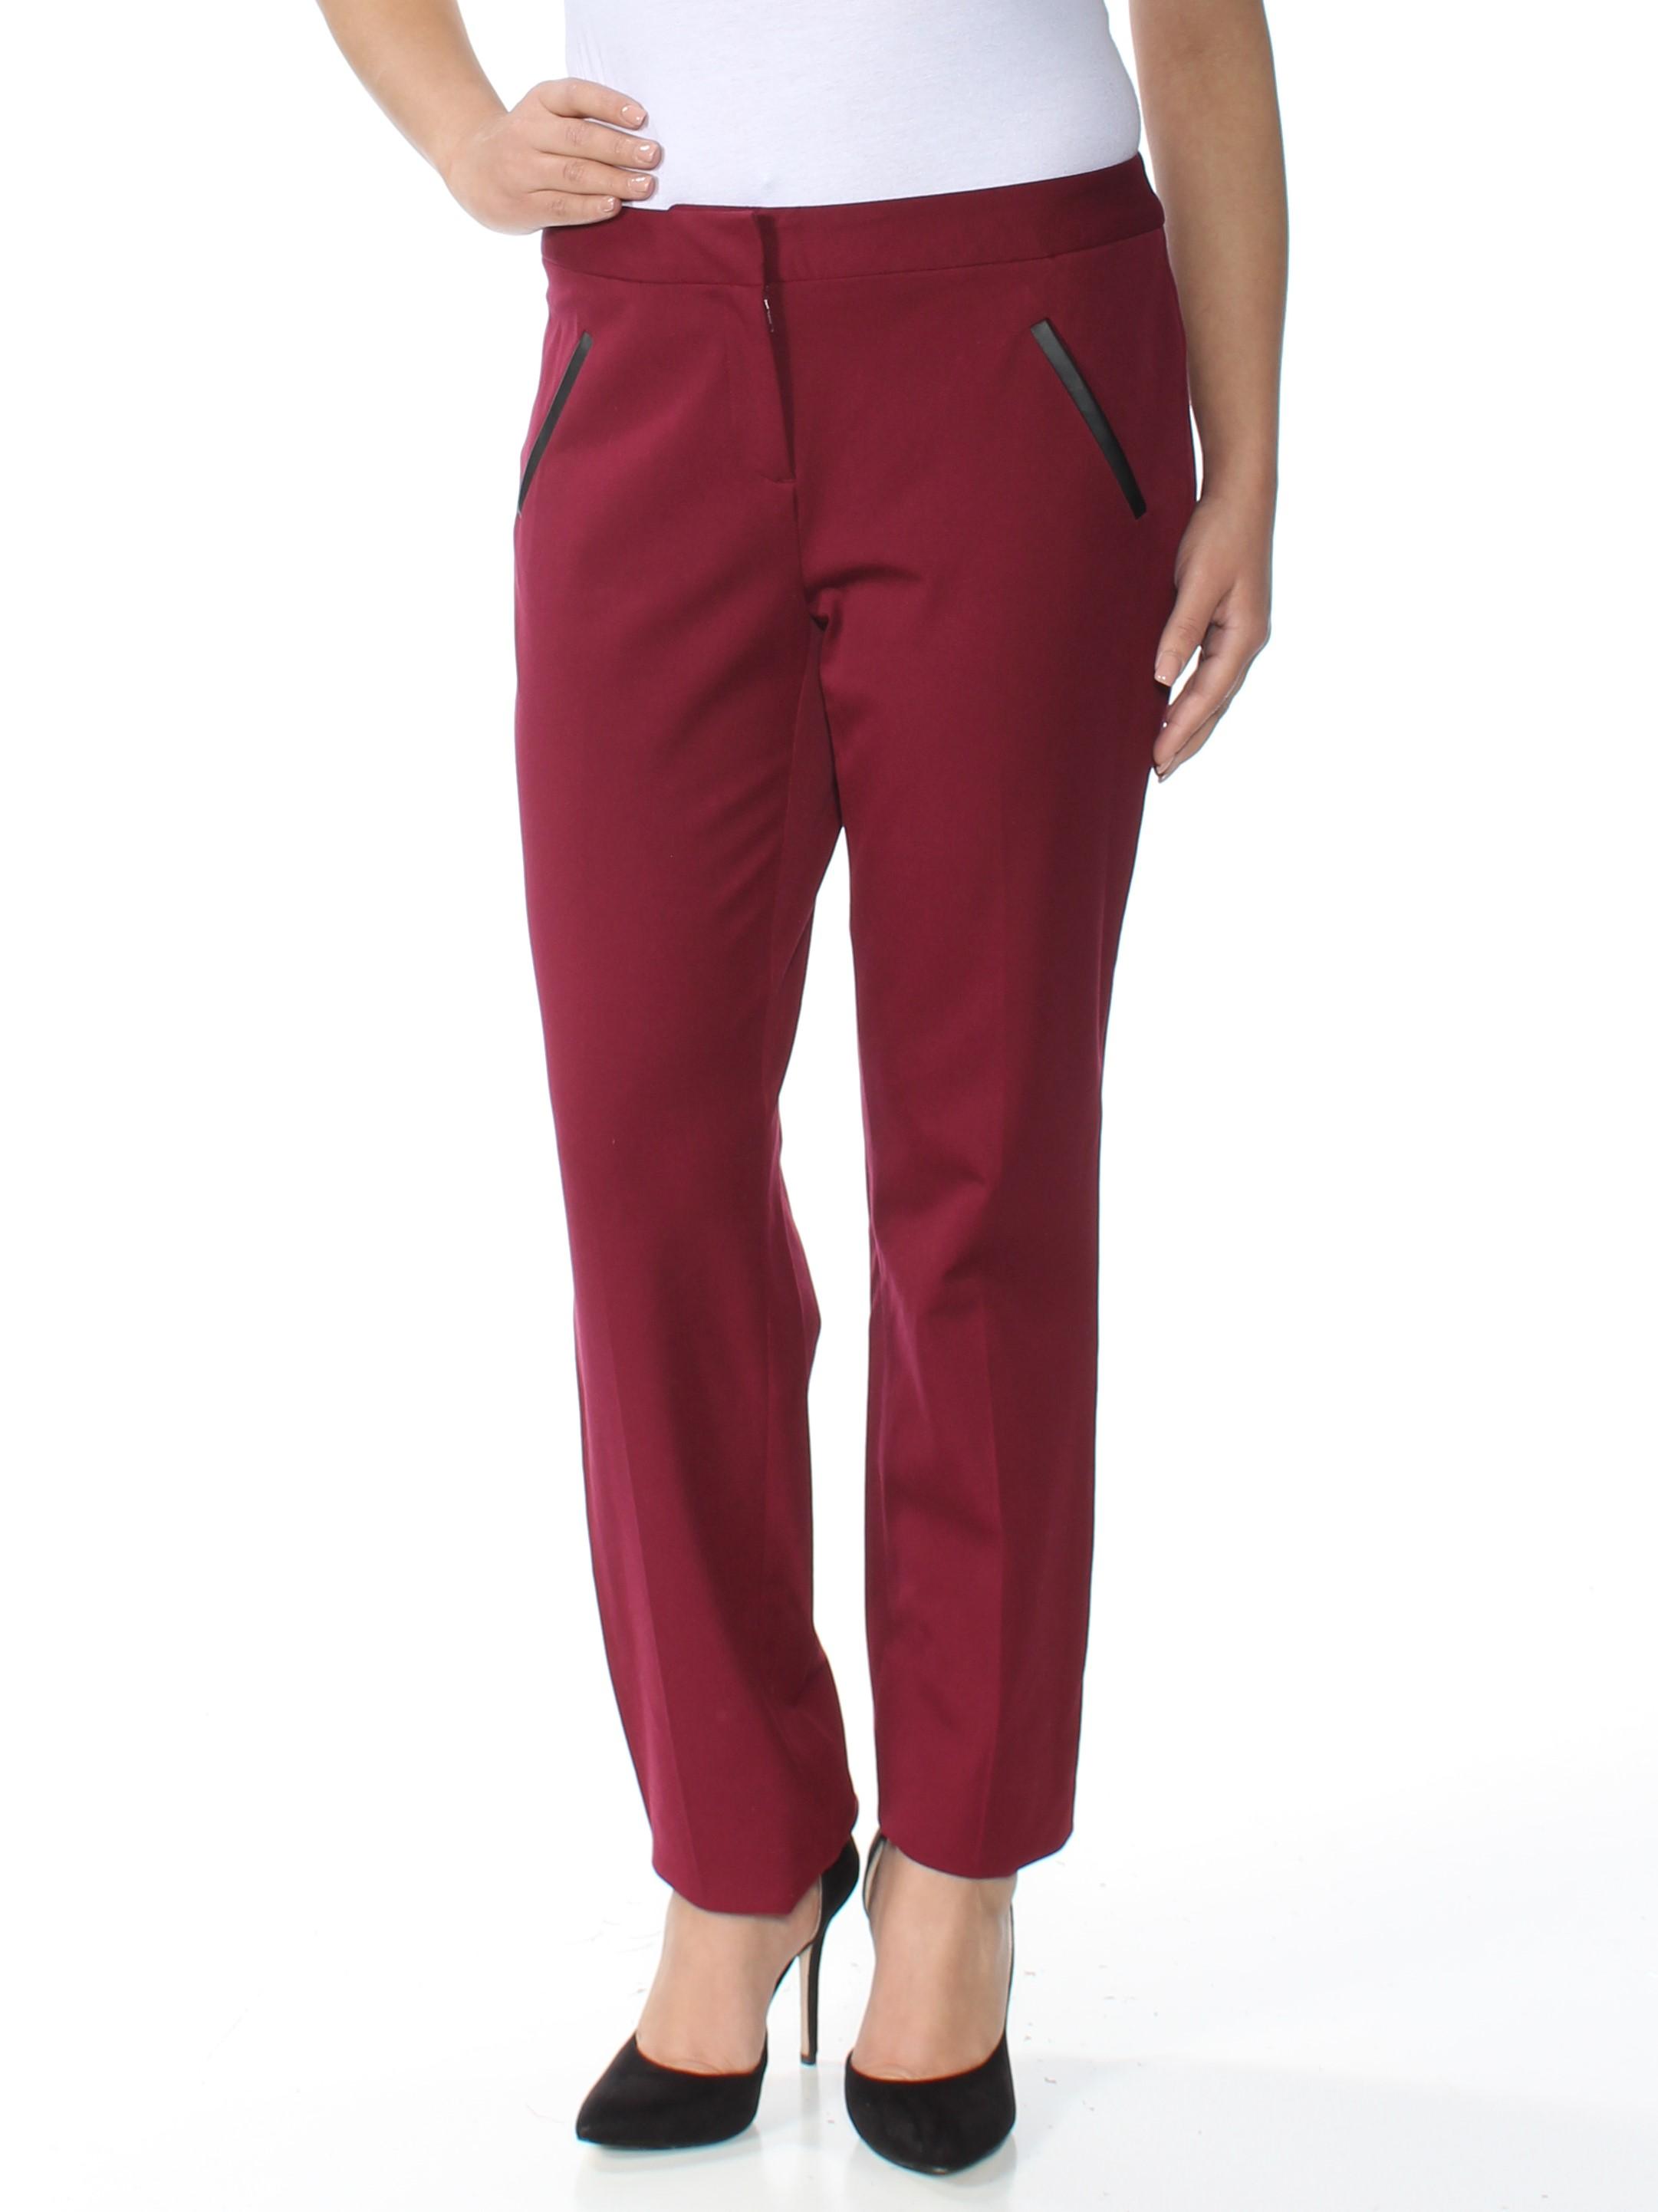 ALFANI Womens Maroon Straight leg Pants  Size: 6